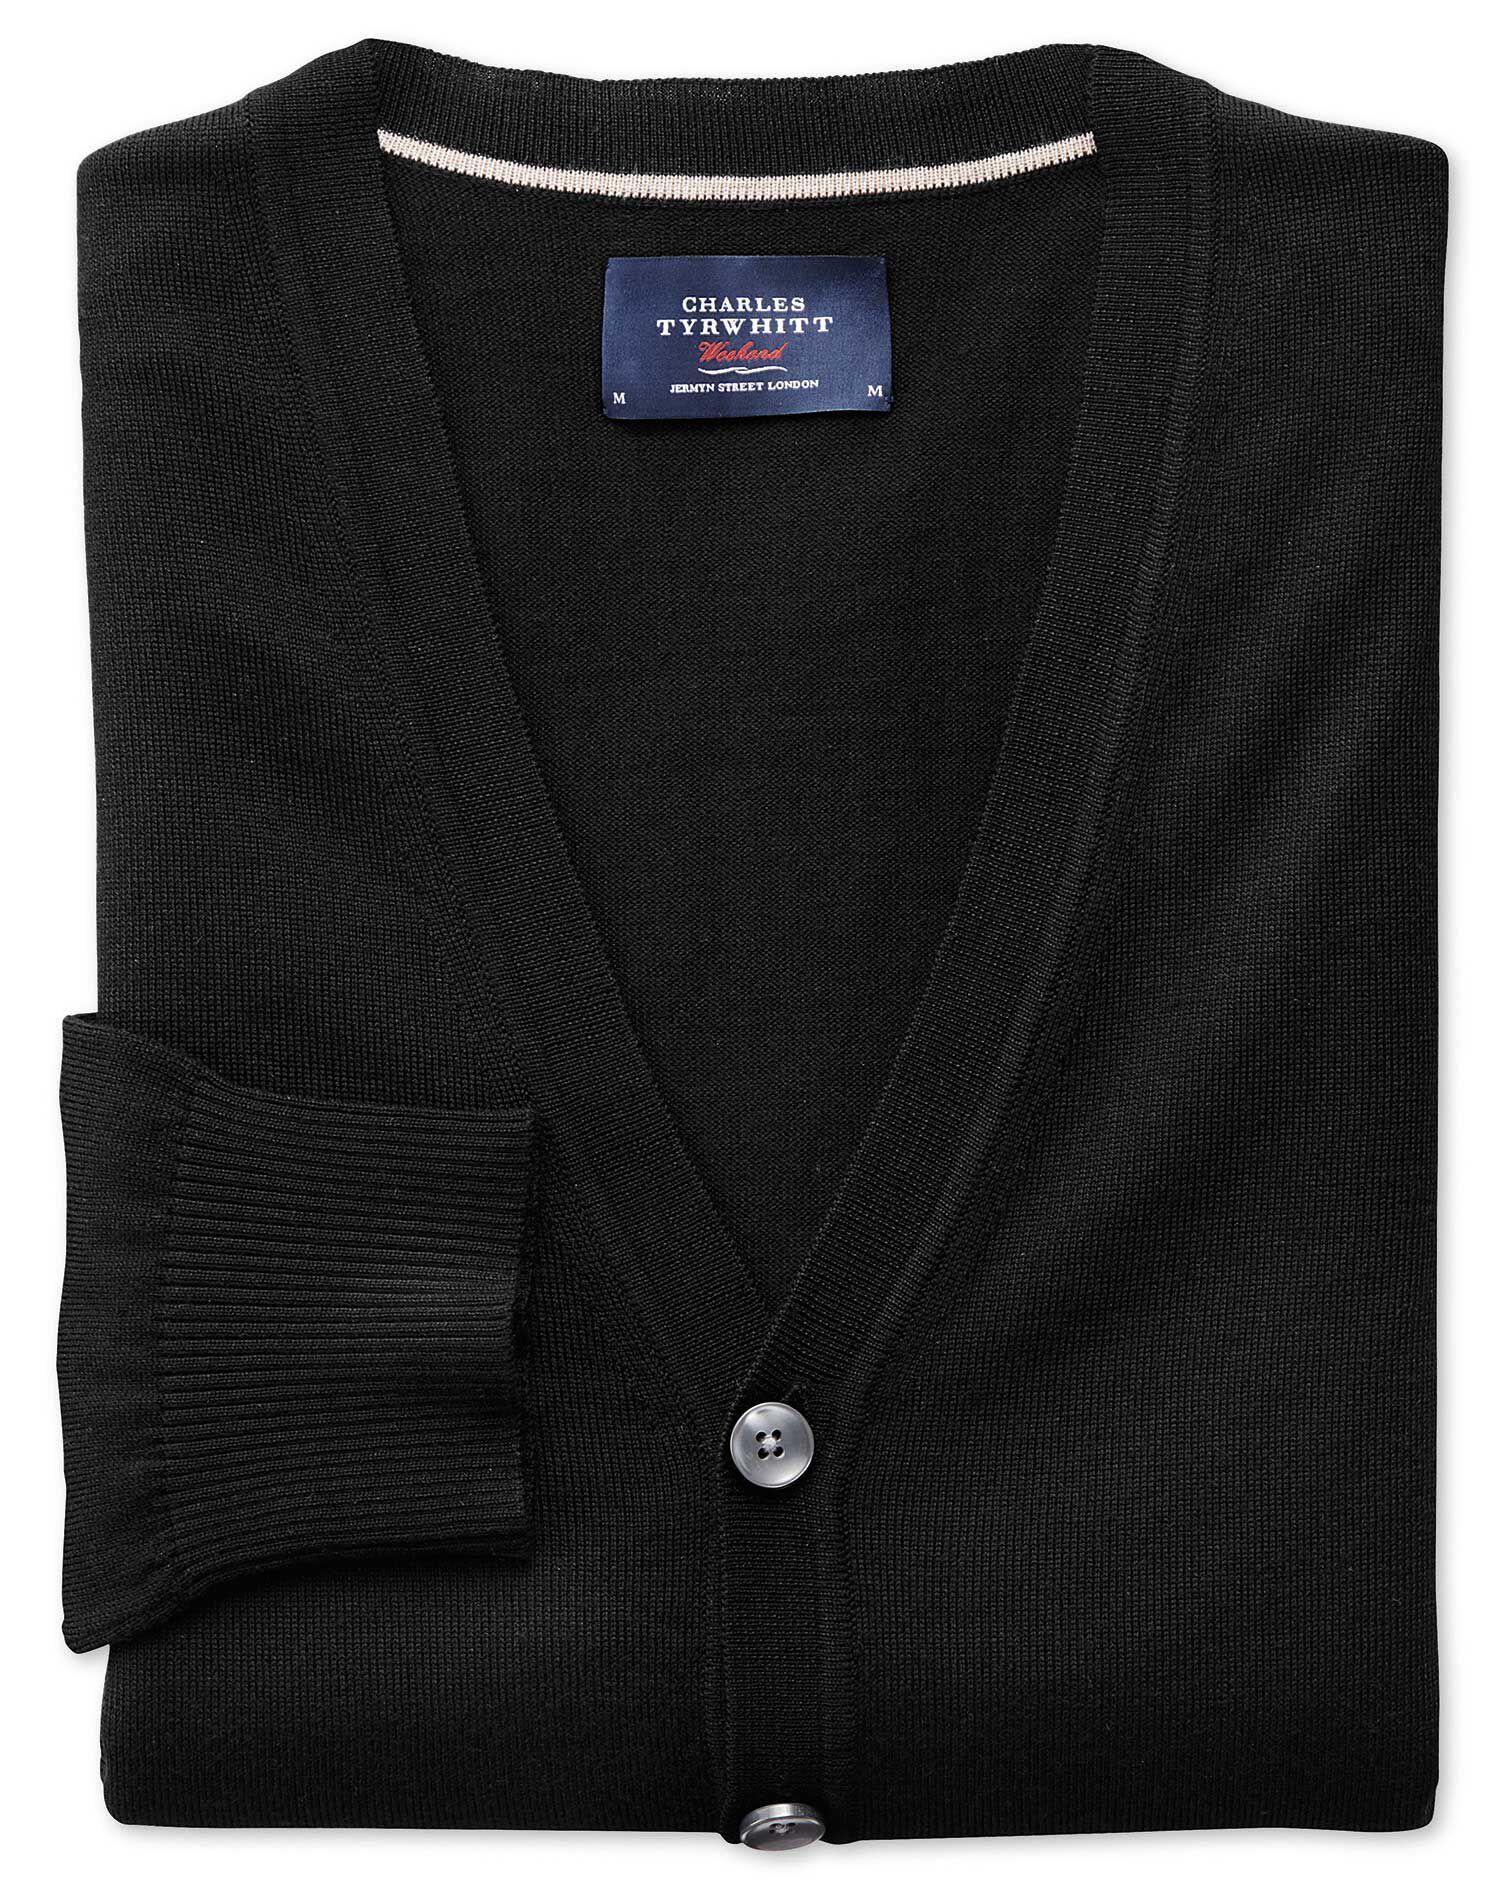 Black Merino Wool Cardigan Size XXL by Charles Tyrwhitt